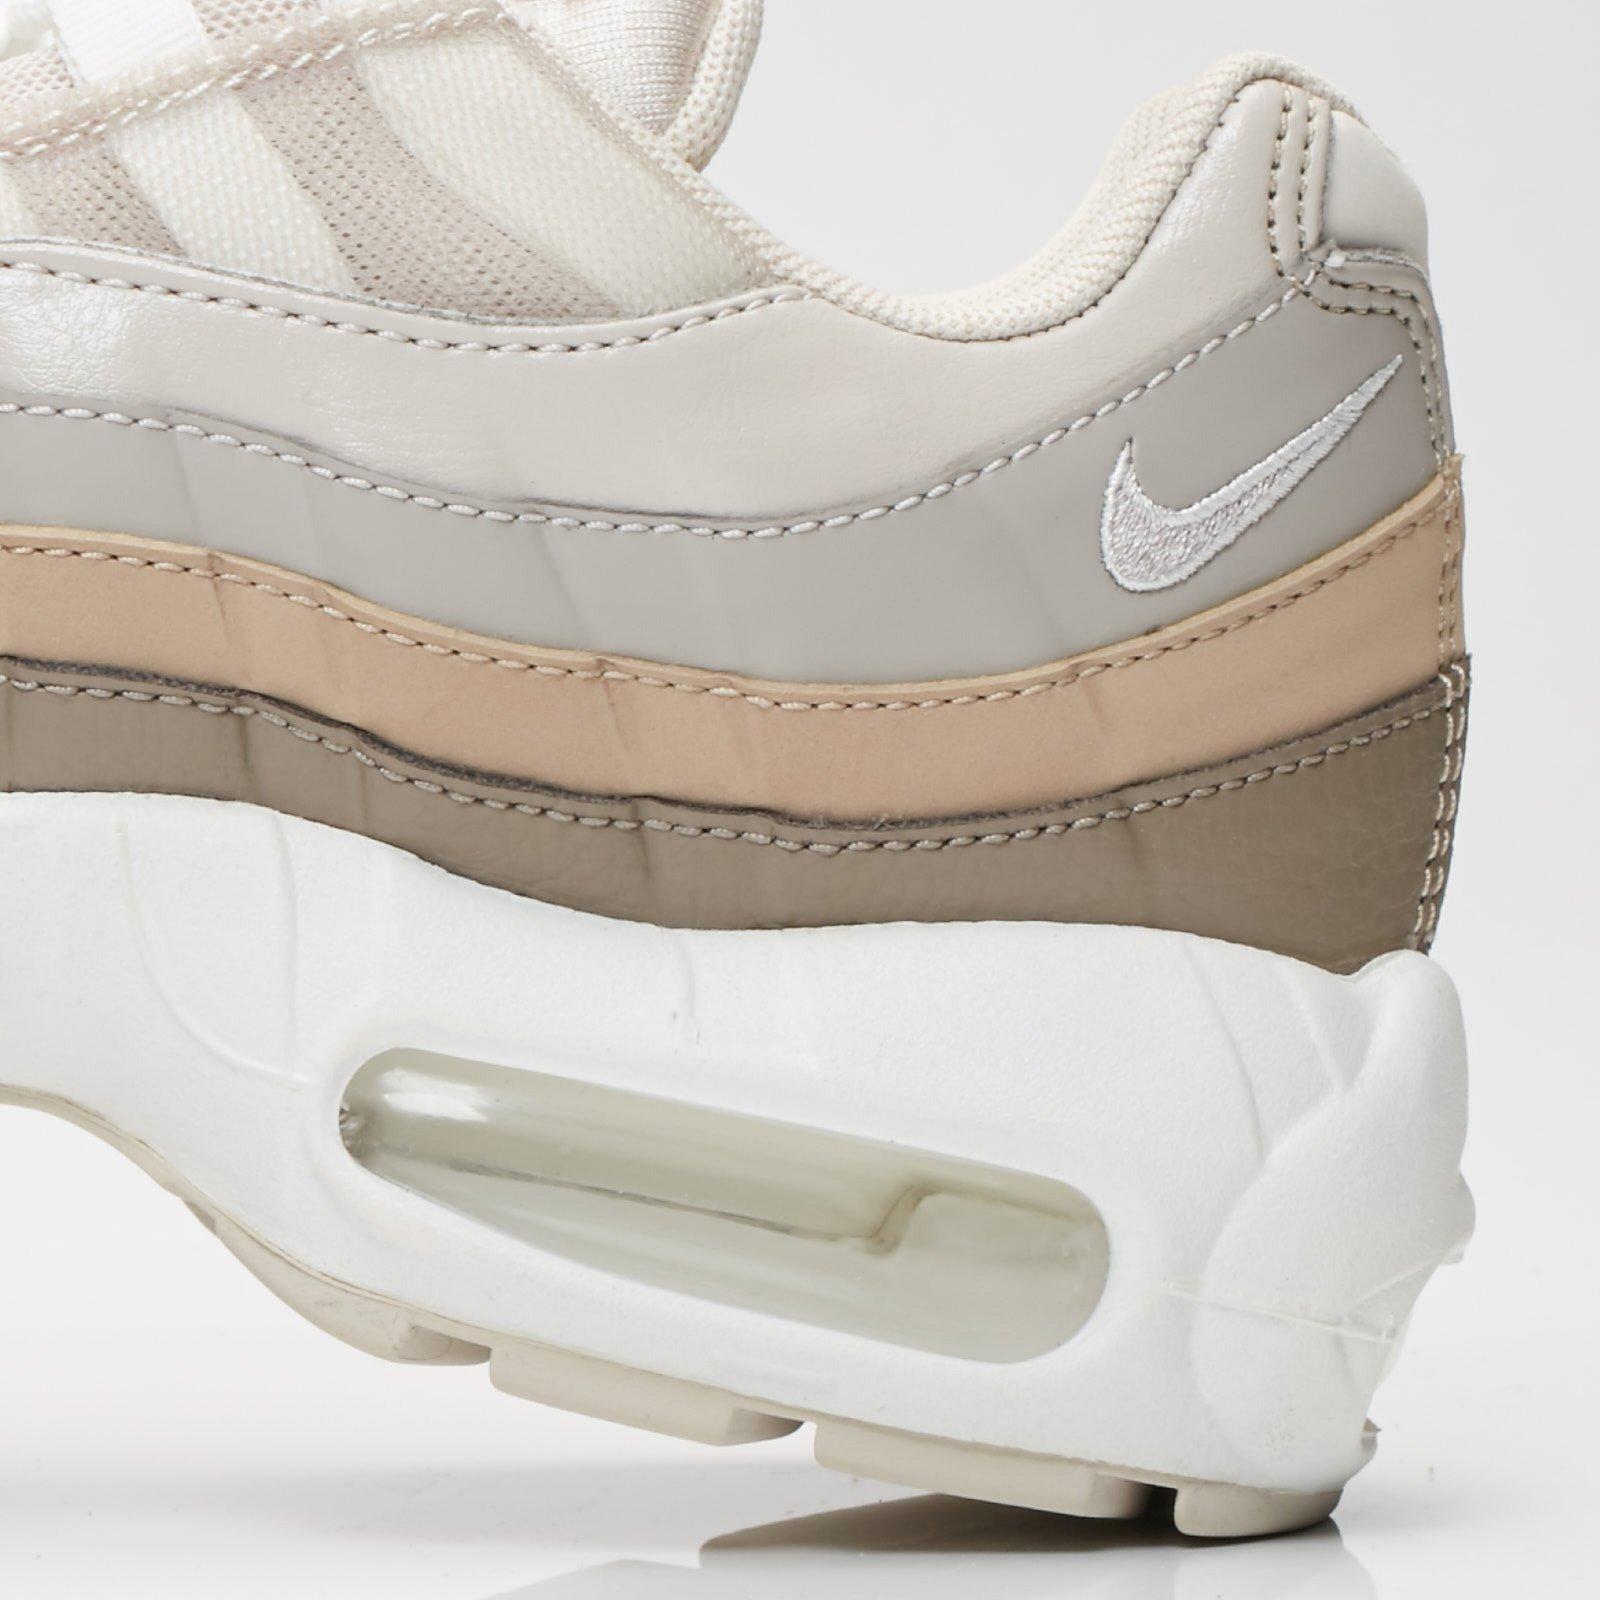 Nike Wmns Air Max 95 307960 015 Sneakersnstuff